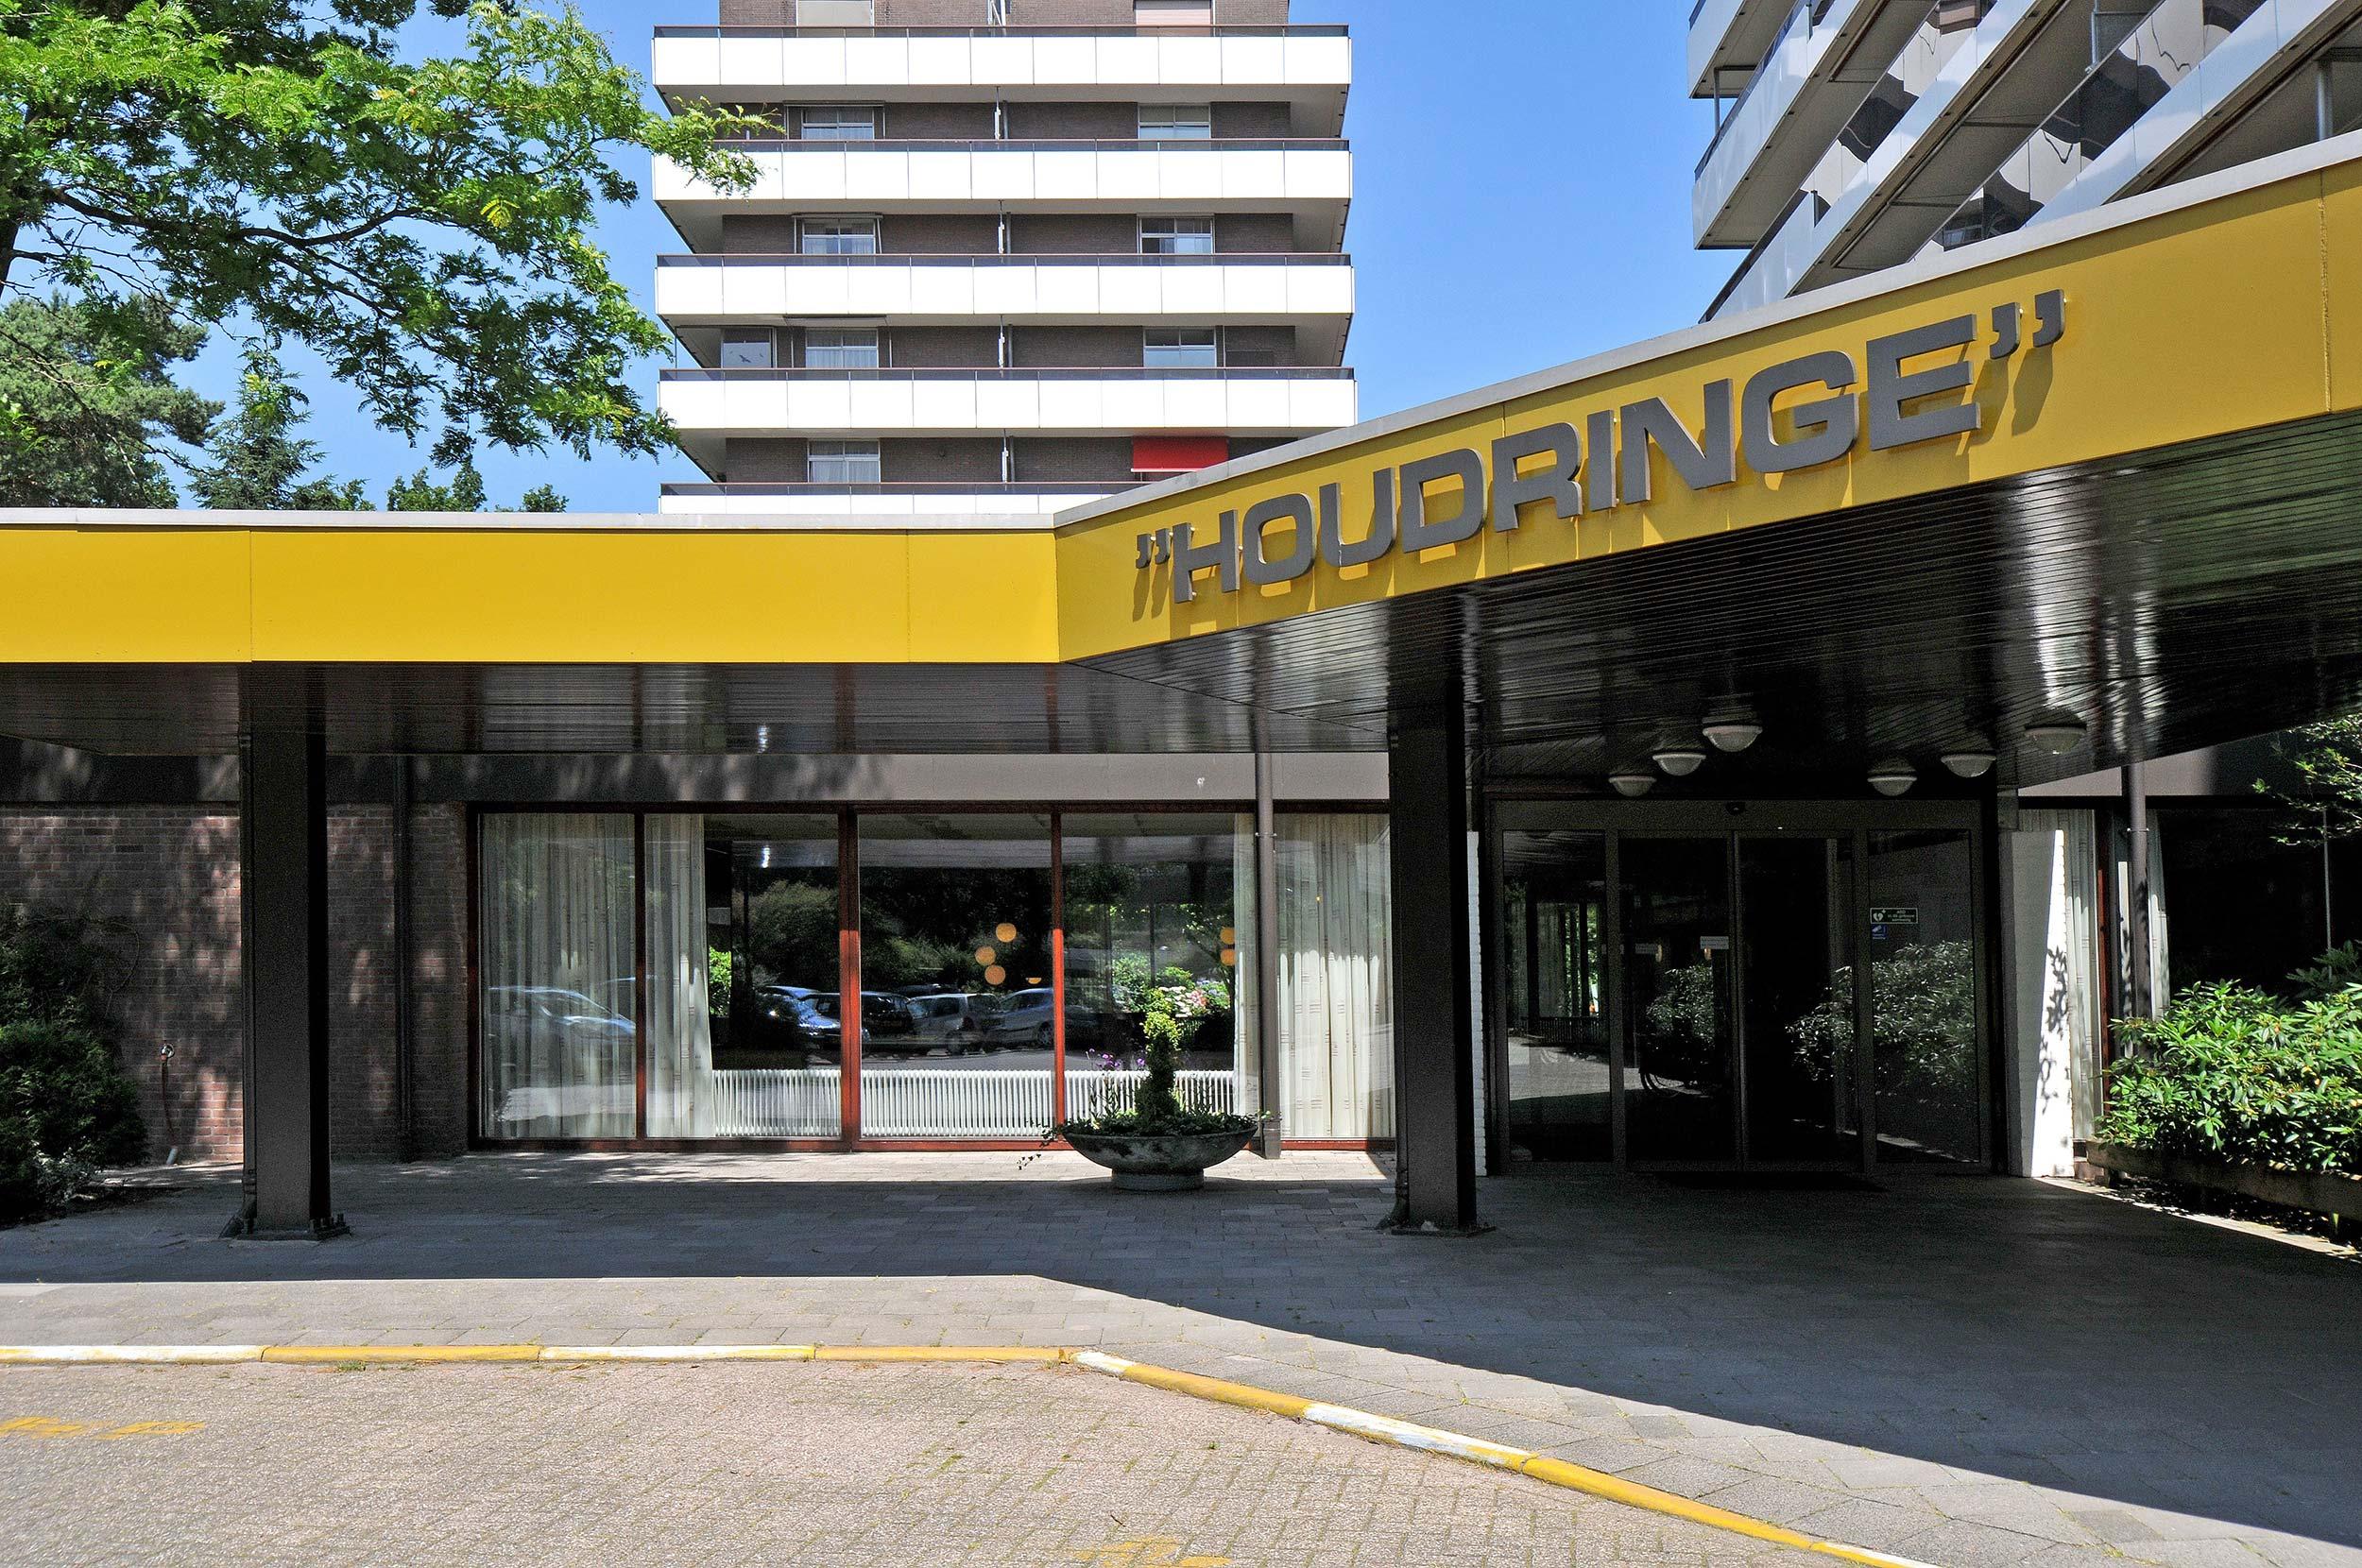 Serviceflat Houdringe entree